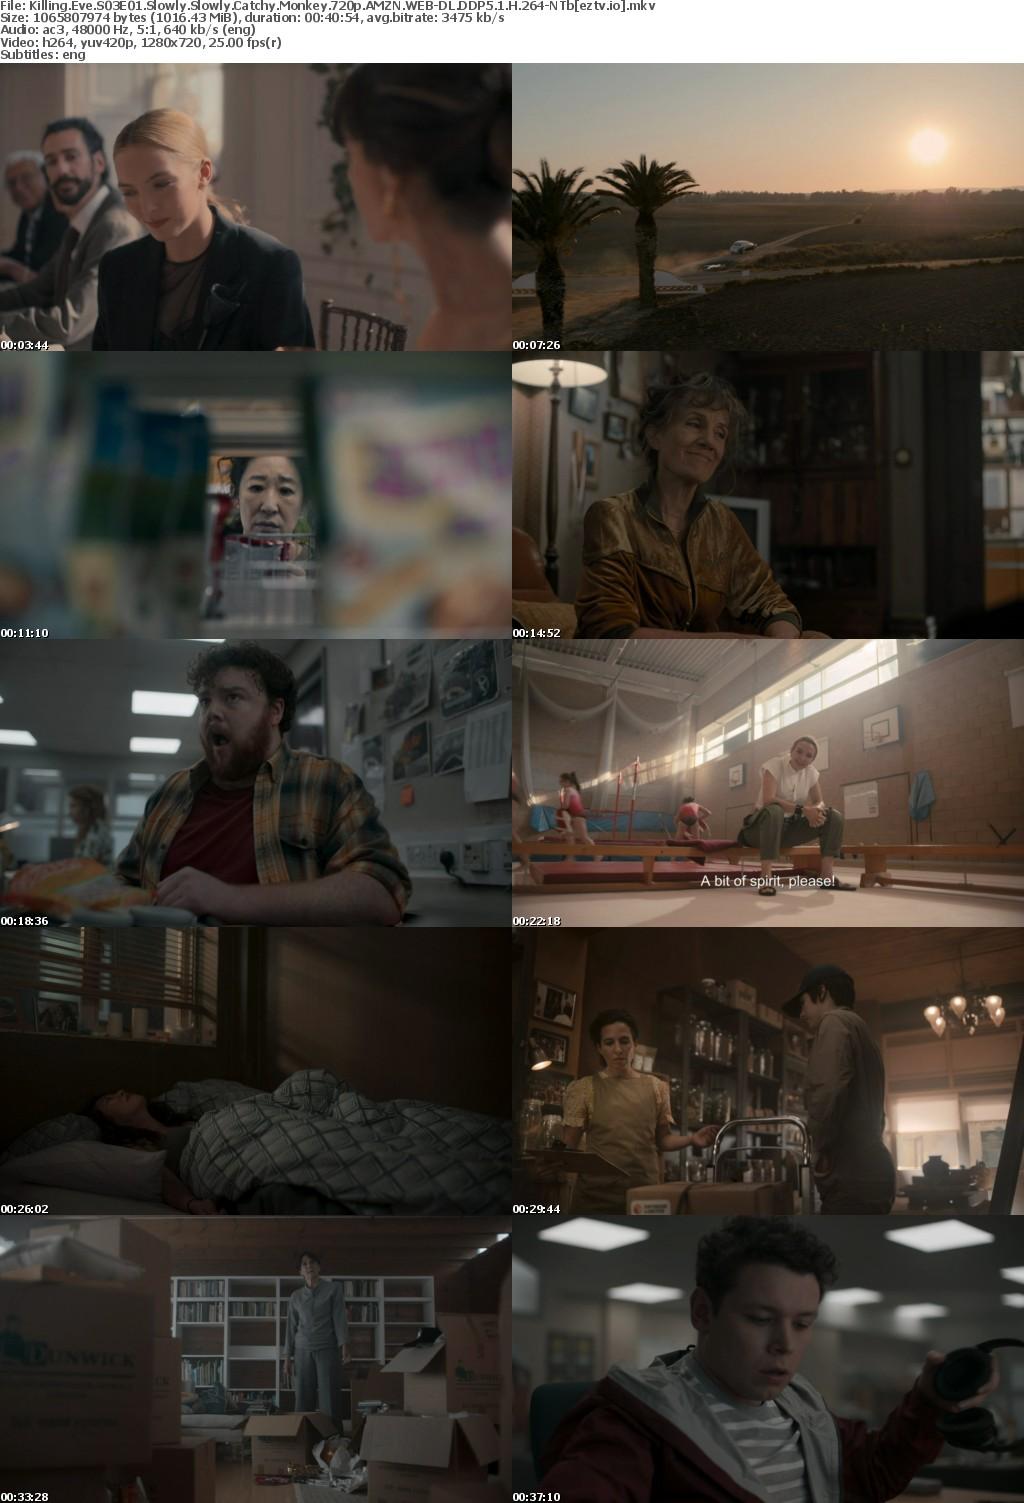 Killing Eve S03E01 Slowly Slowly Catchy Monkey 720p AMZN WEB-DL DDP5 1 H 264-NTb